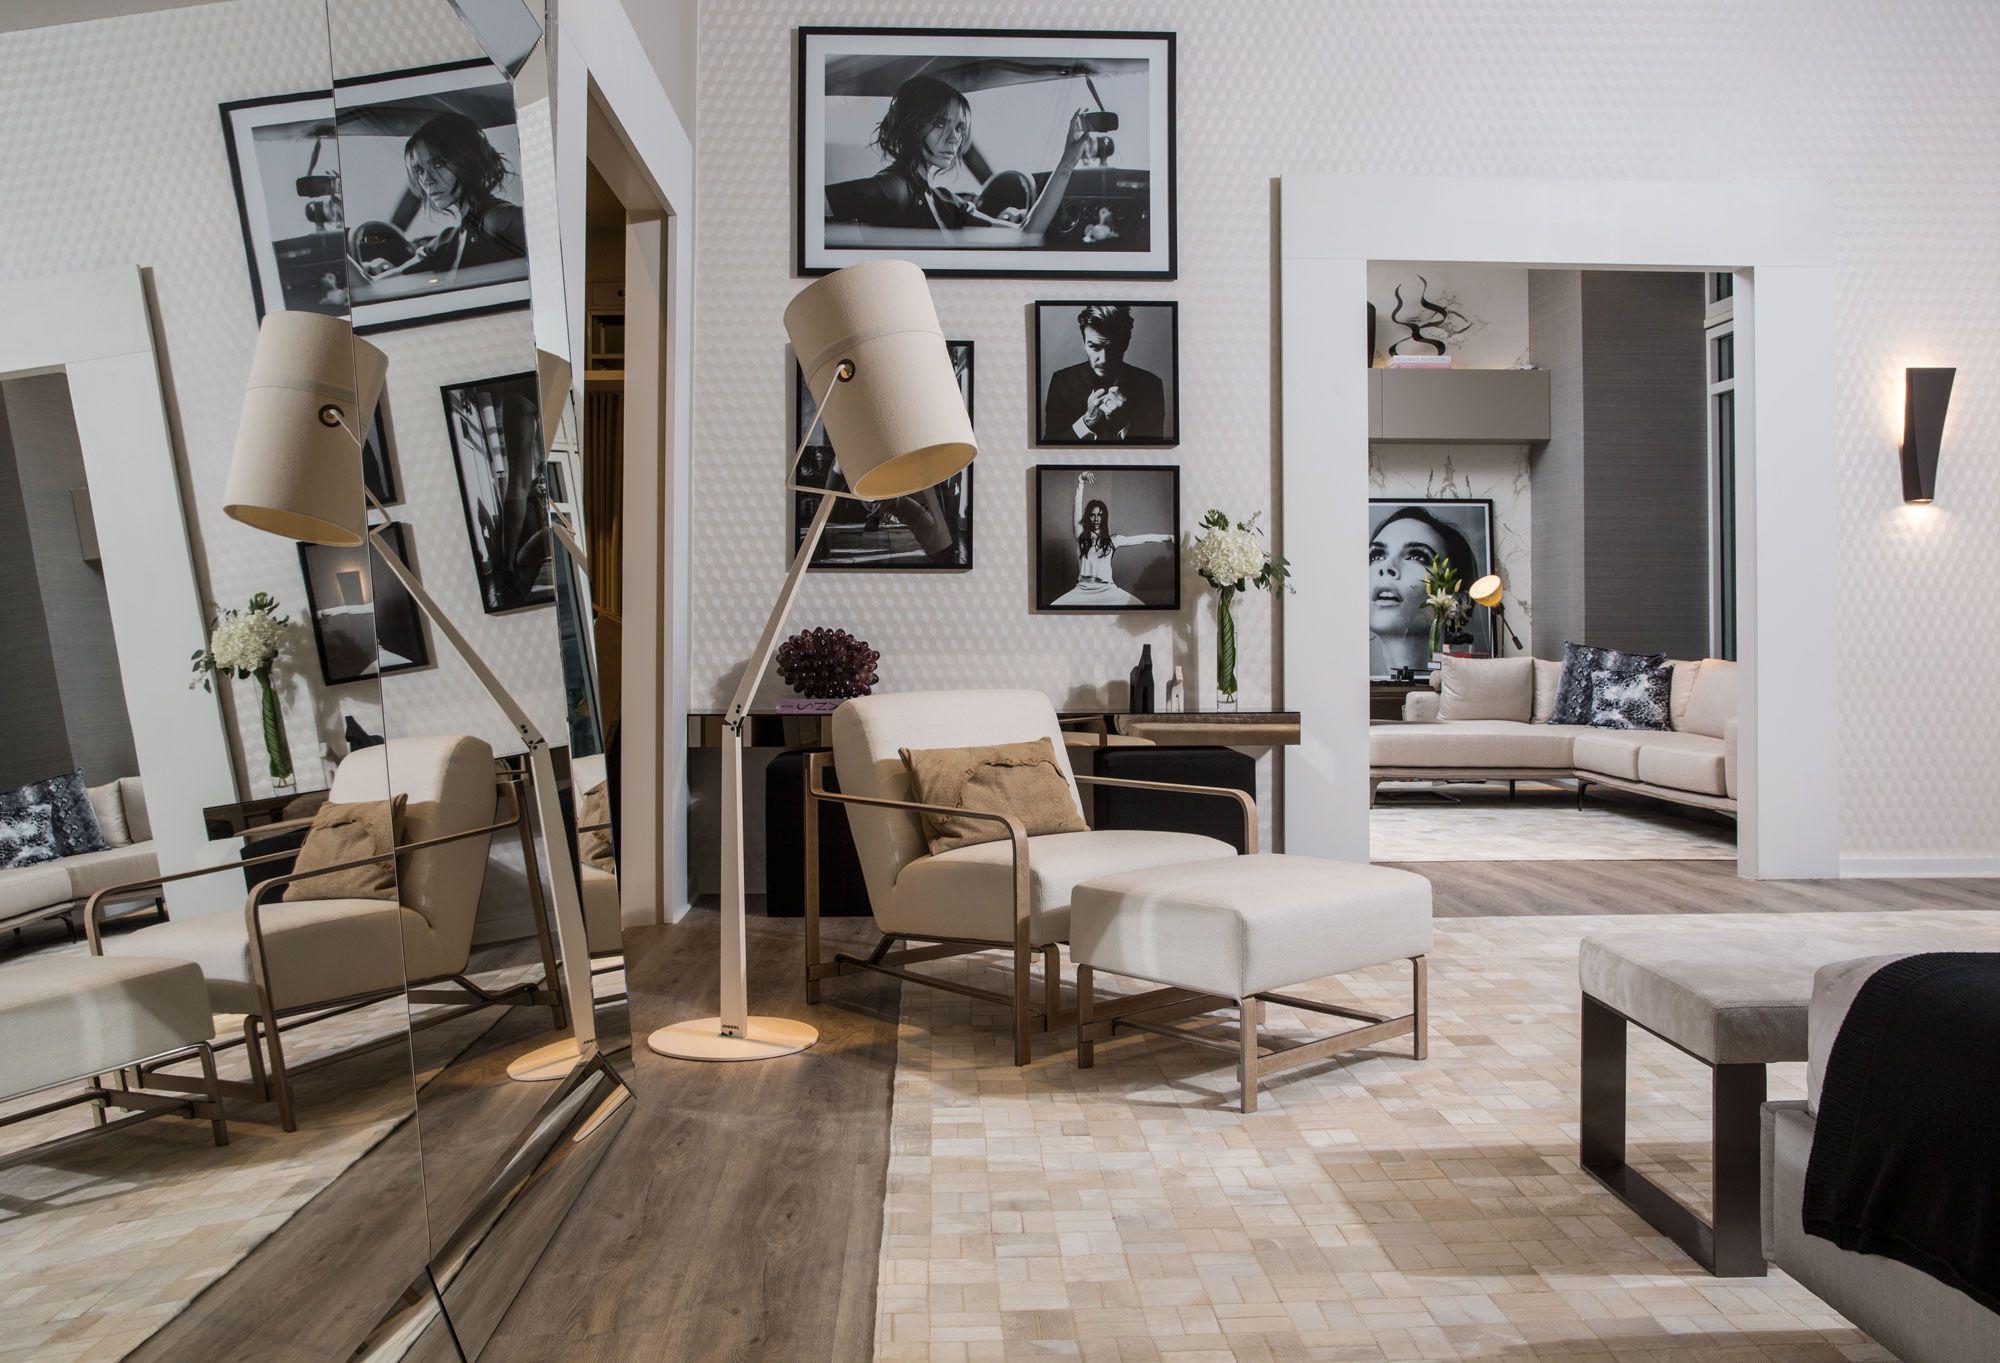 Designer Interiors 9 Fashion Designer Interiors To Inspire Your Own Décor  Victoria